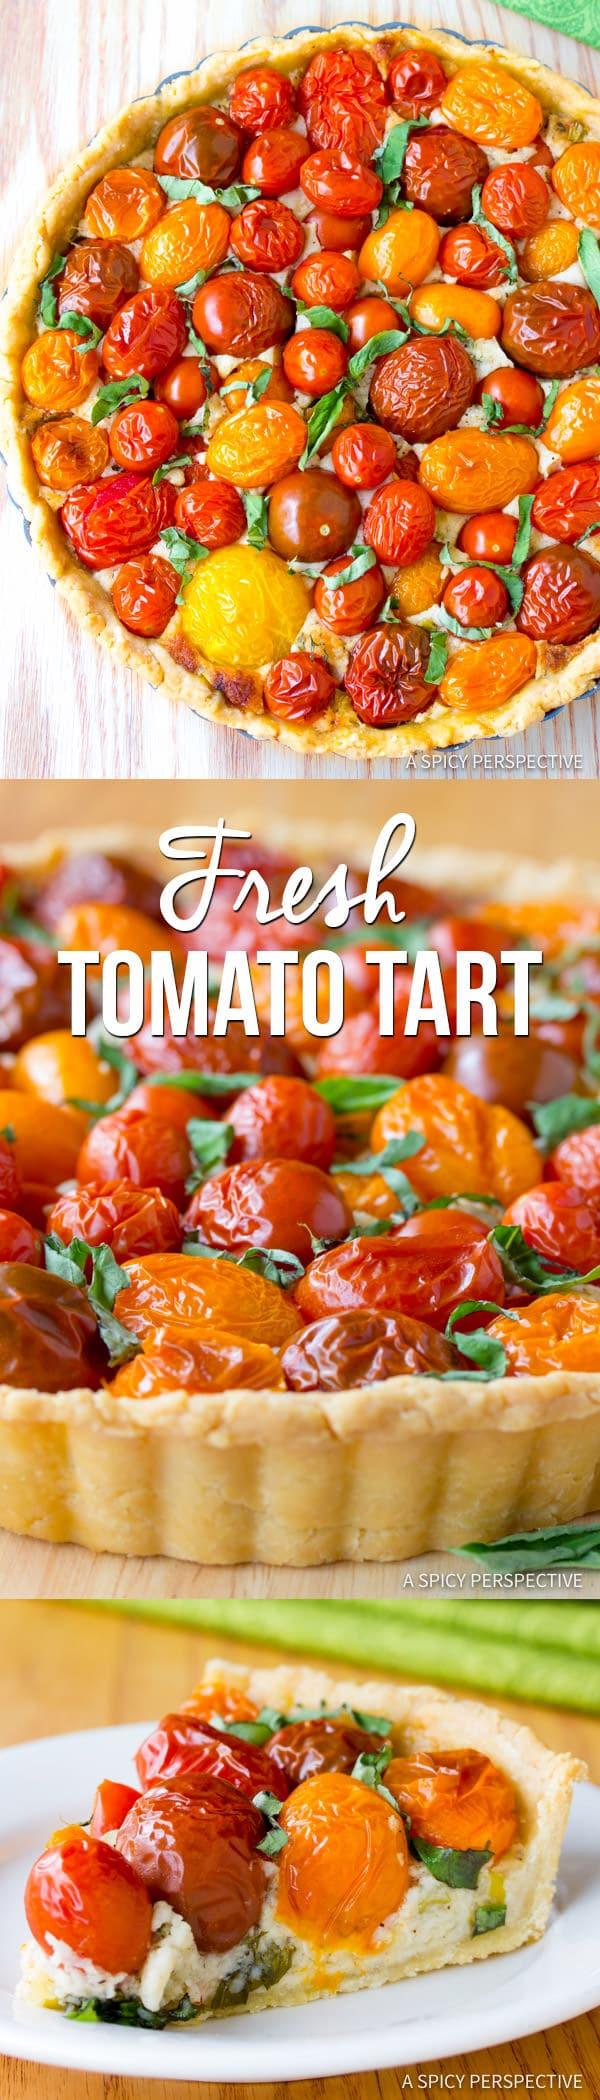 Perfect Southern Fresh Tomato Tart Recipe | ASpicyPerspective.com